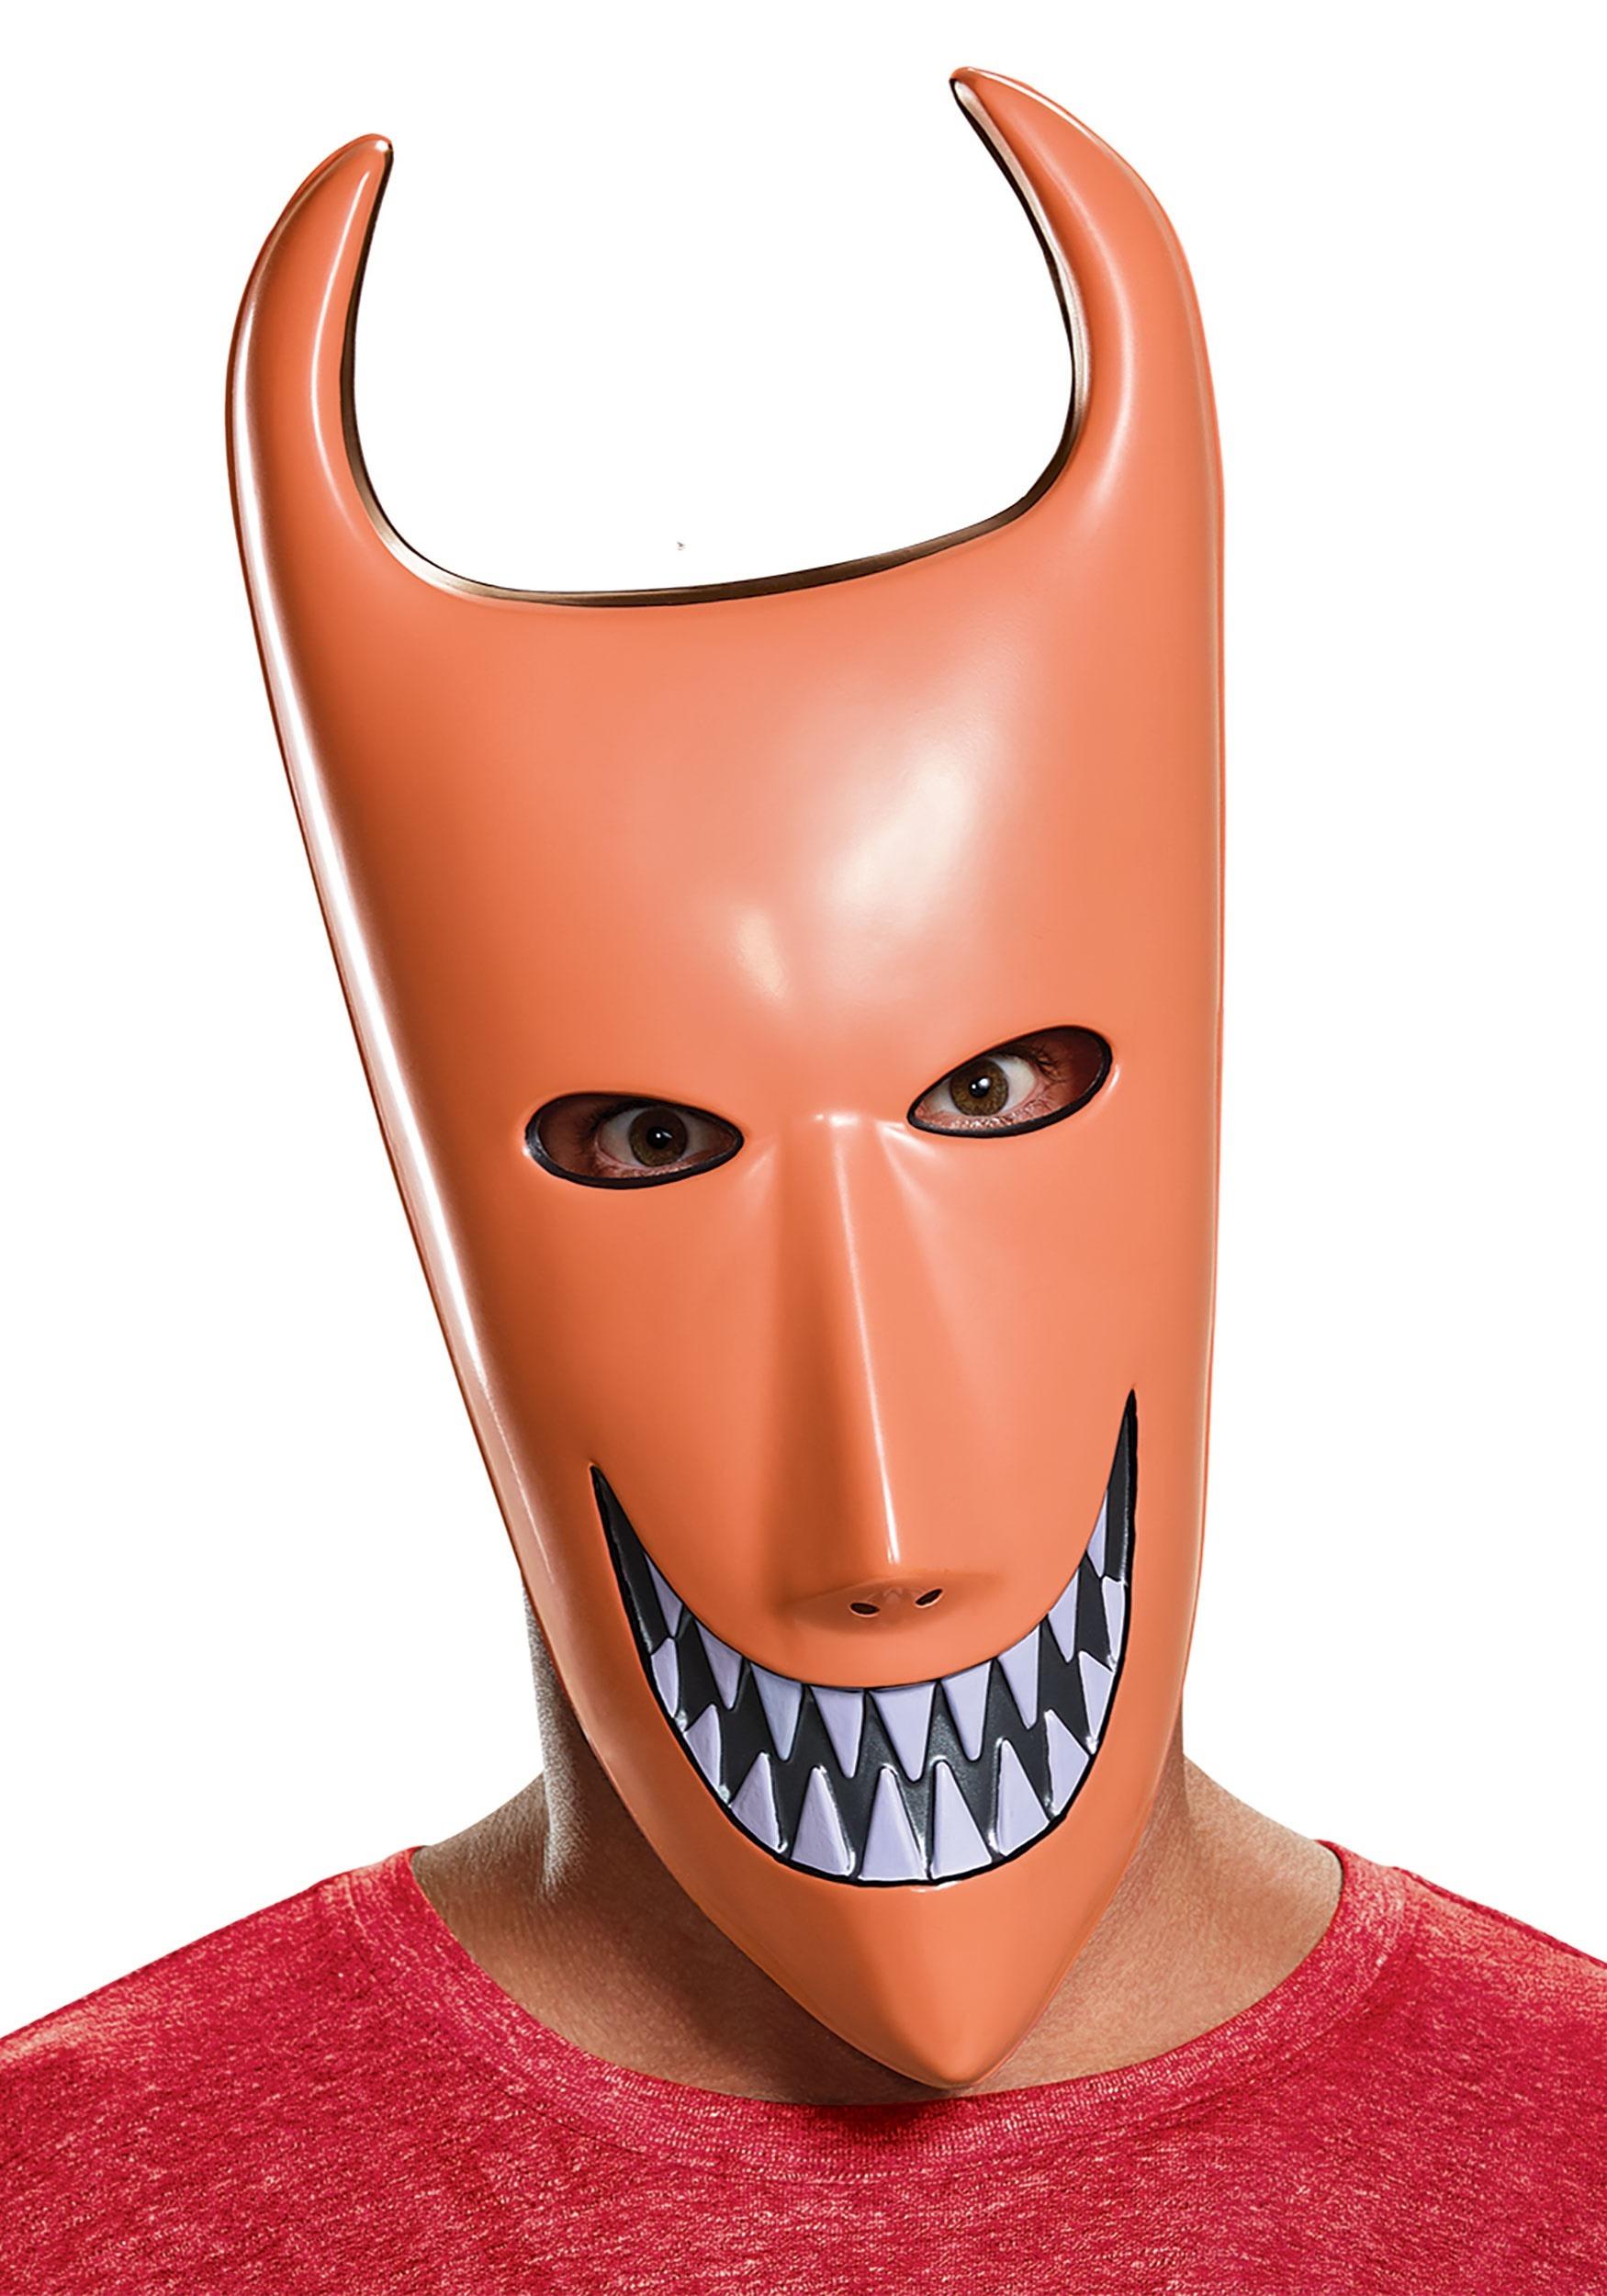 nightmare before christmas adult lock mask - Lock The Nightmare Before Christmas